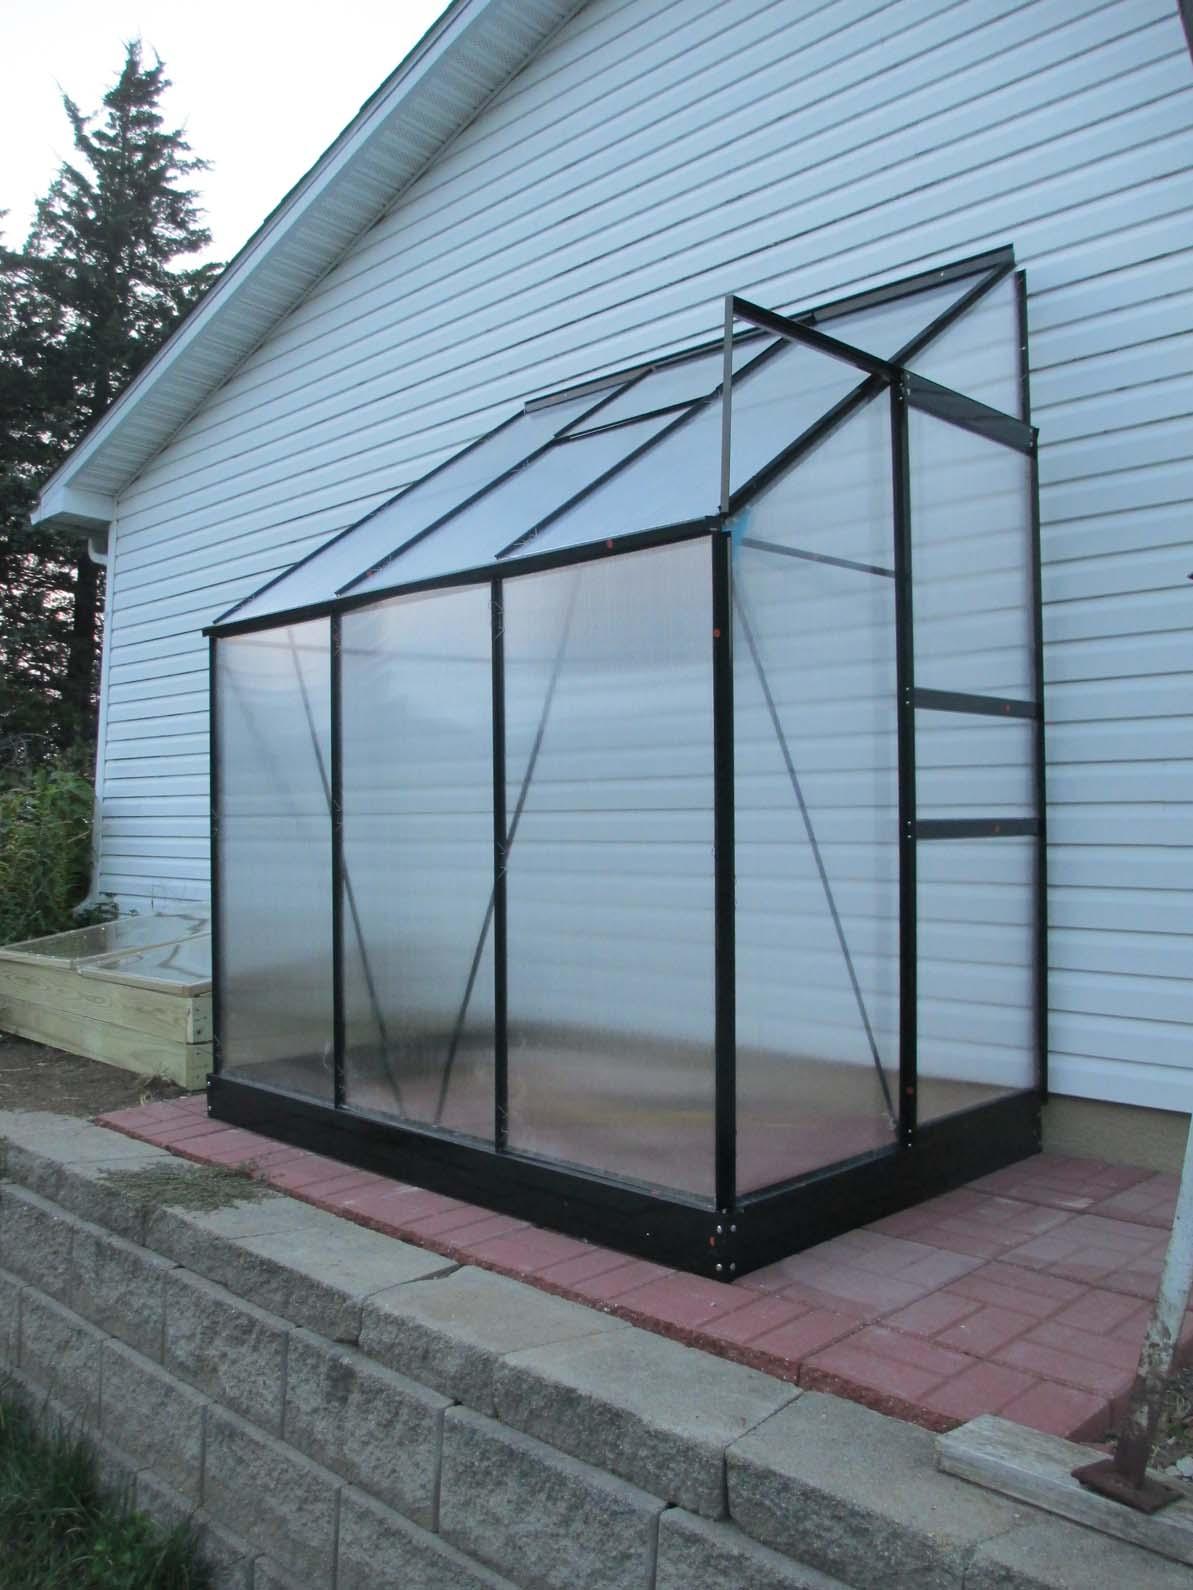 Sunroom addition joy studio design gallery best design for Greenhouse sunroom addition